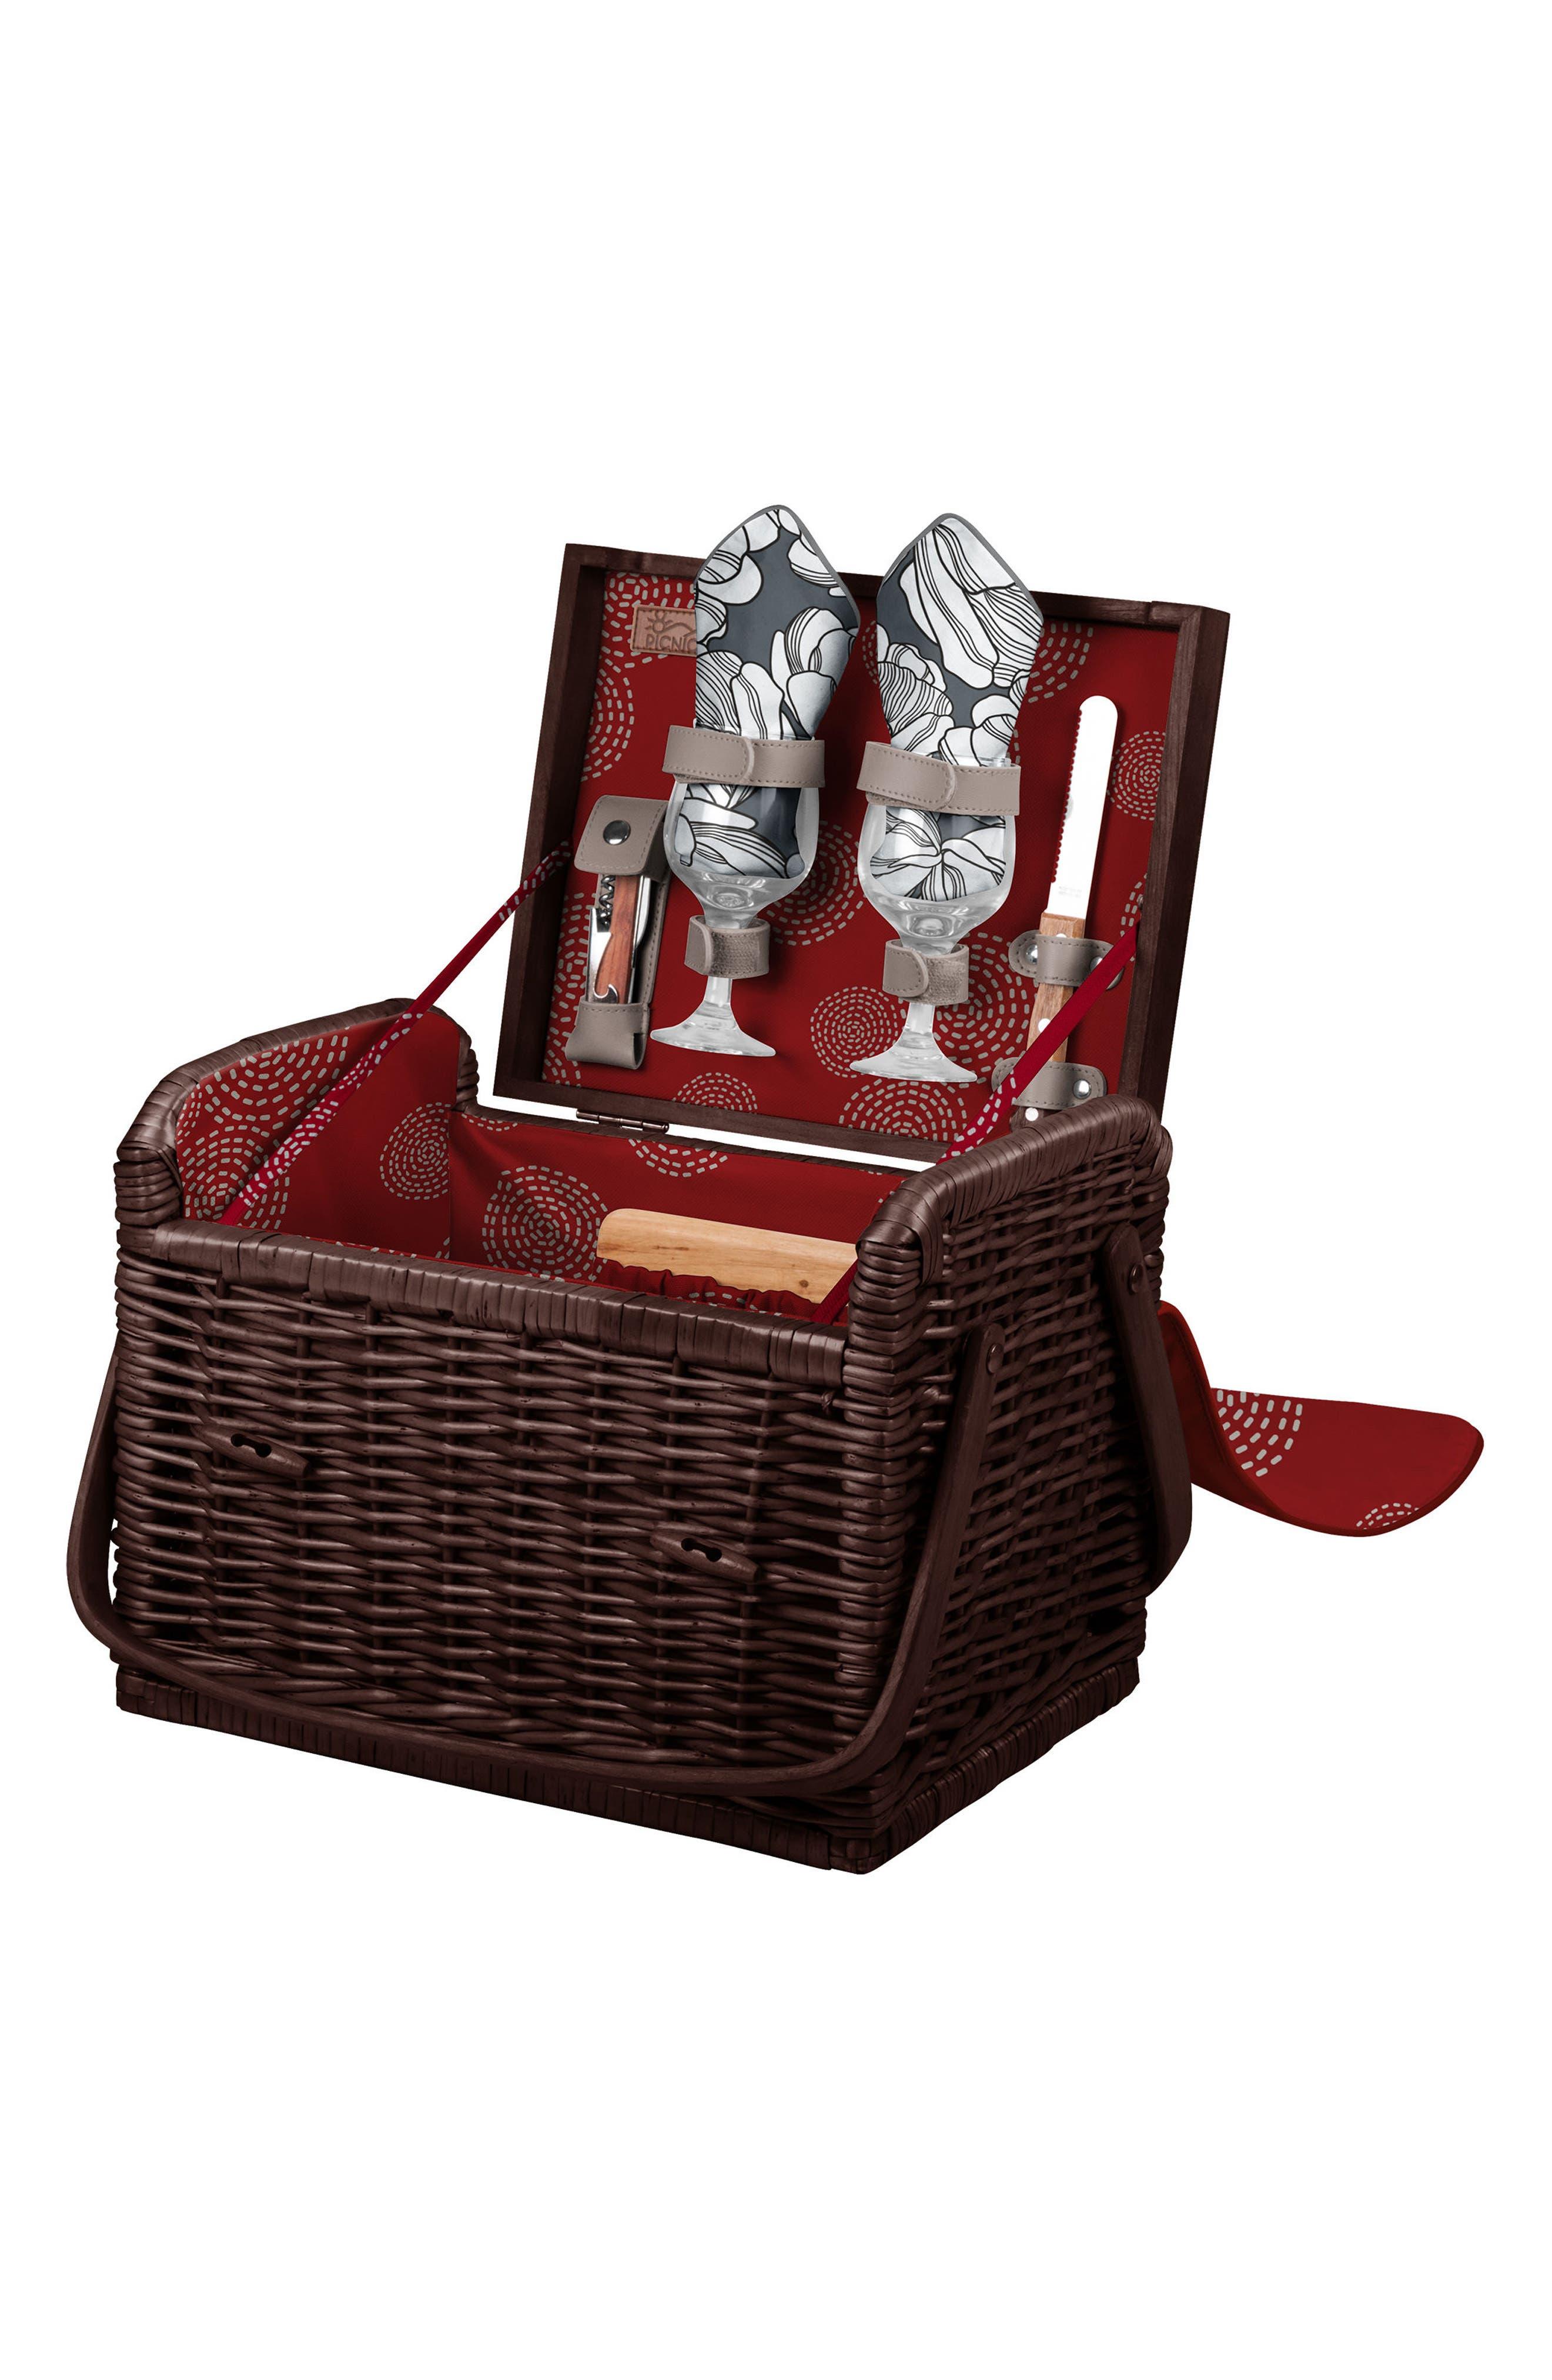 Alternate Image 2  - Picnic Time Kabrio Wine & Cheese Picnic Basket